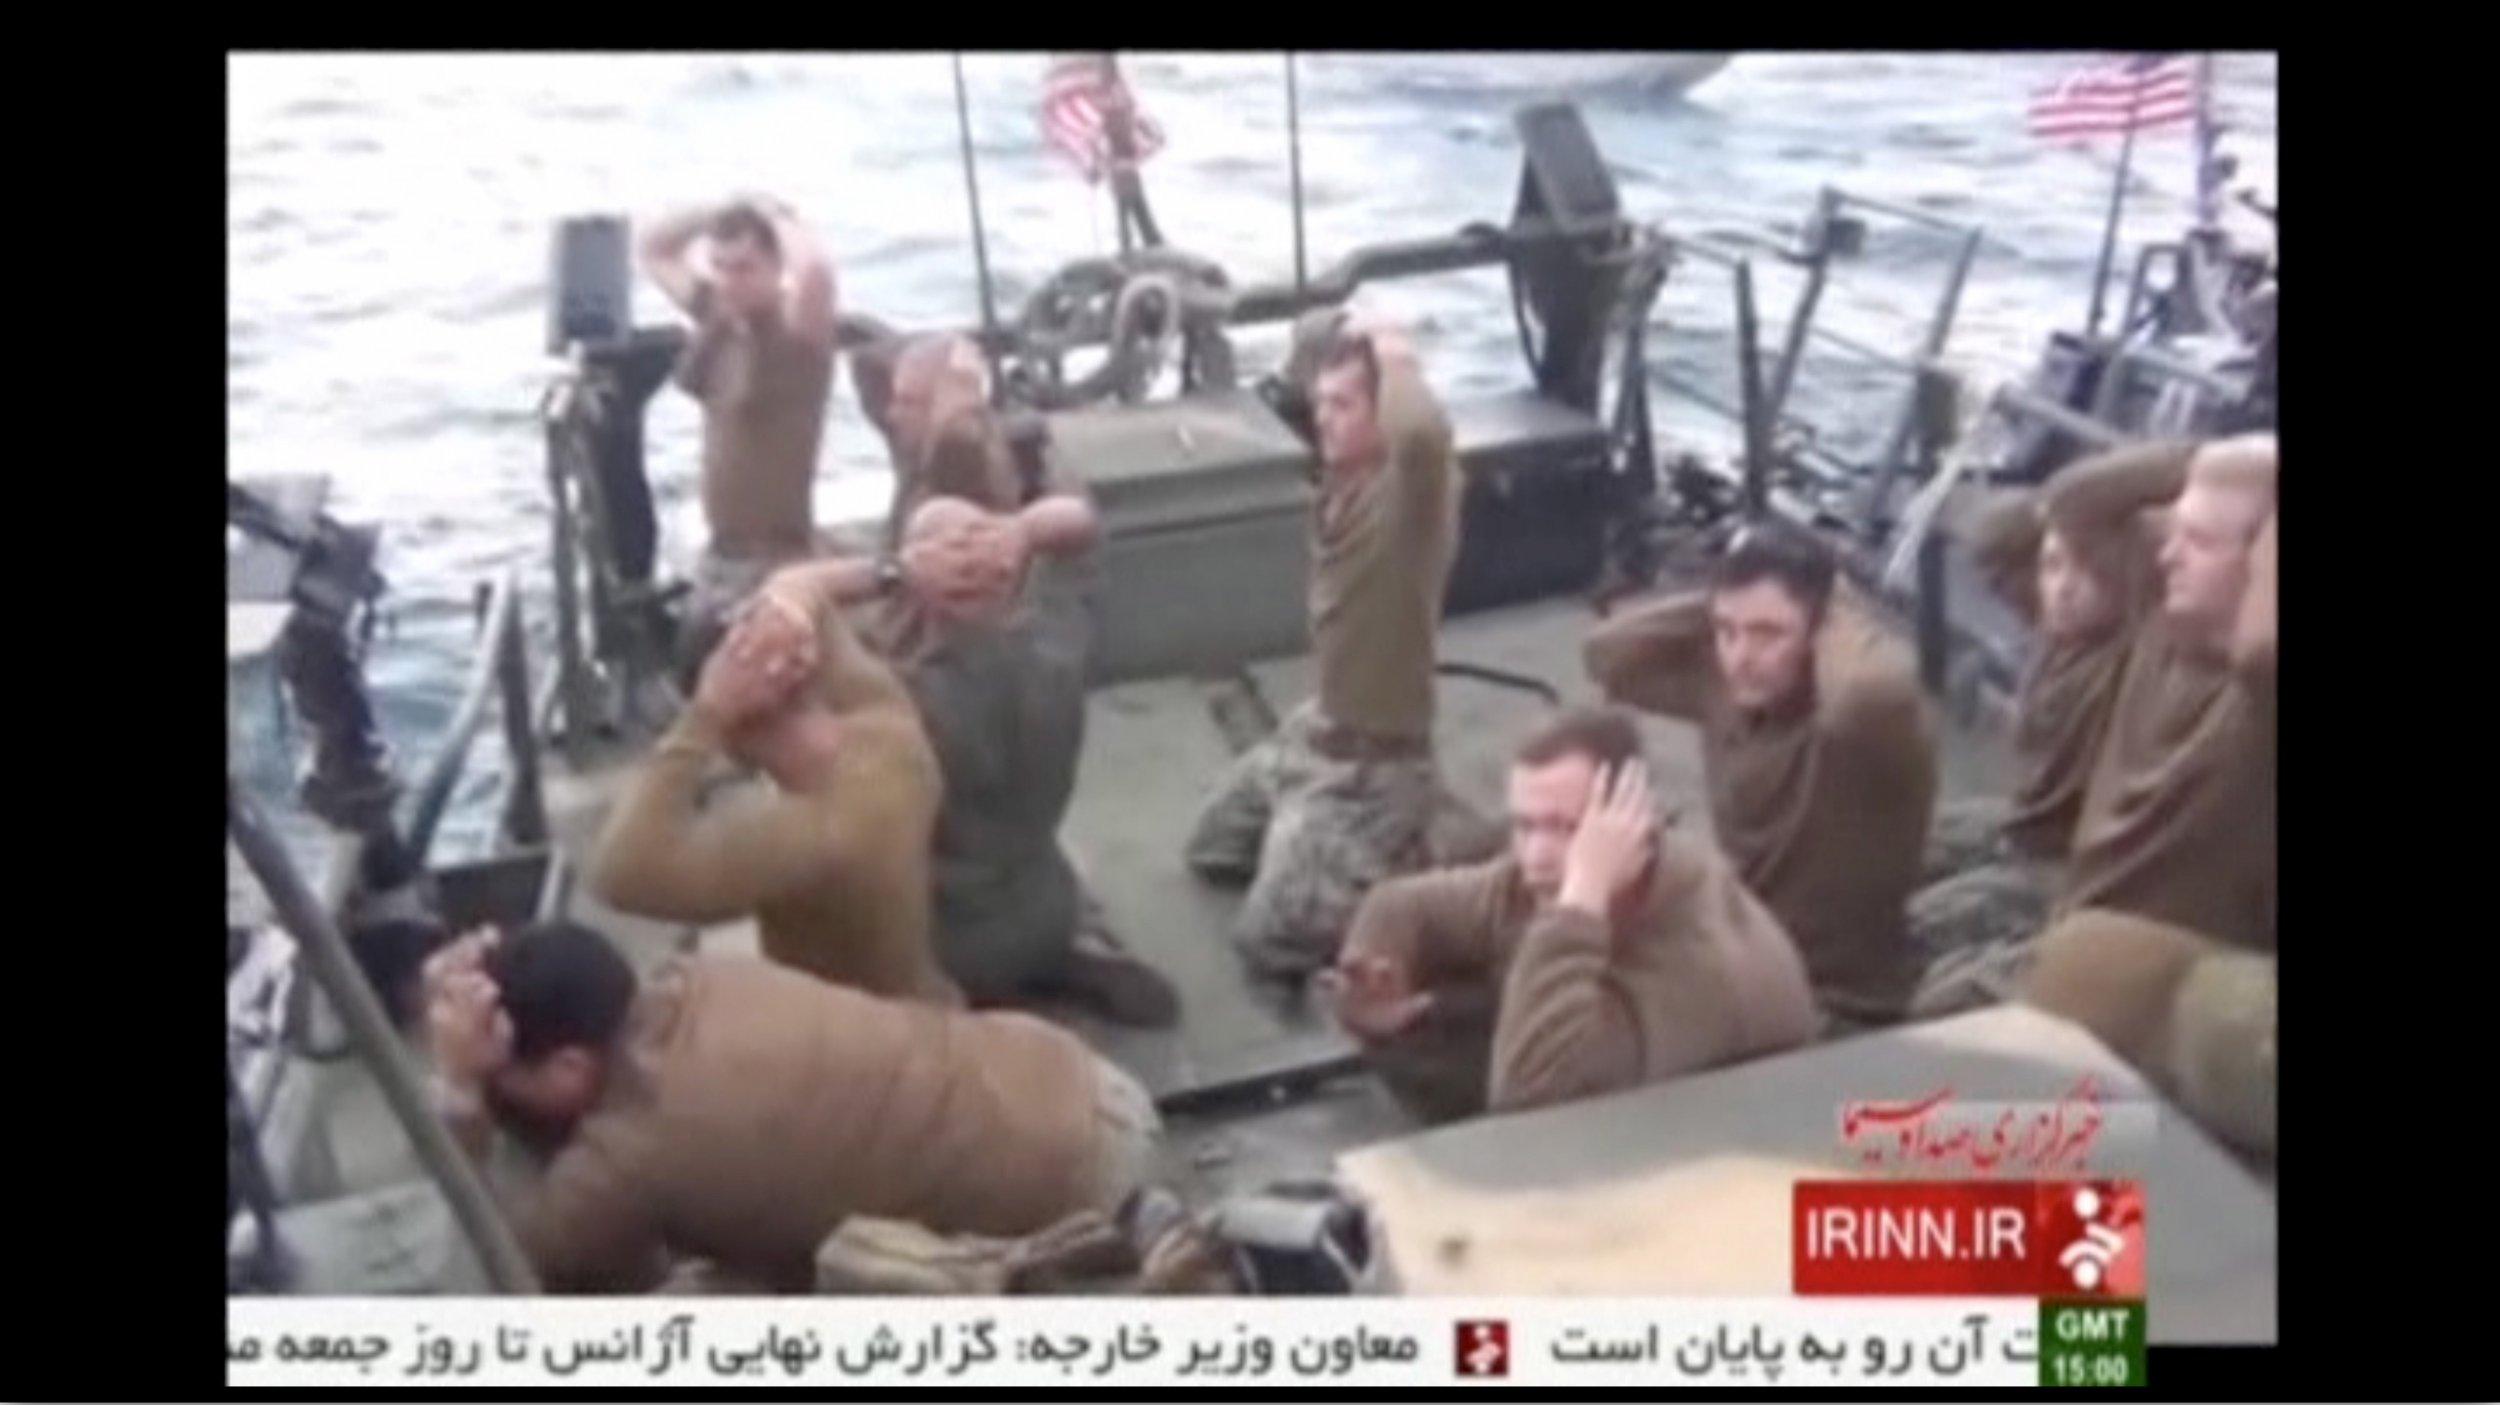 2016-01-13T195806Z_1_LYNXNPEC0C1A4_RTROPTP_4_USA-IRAN-BOATS